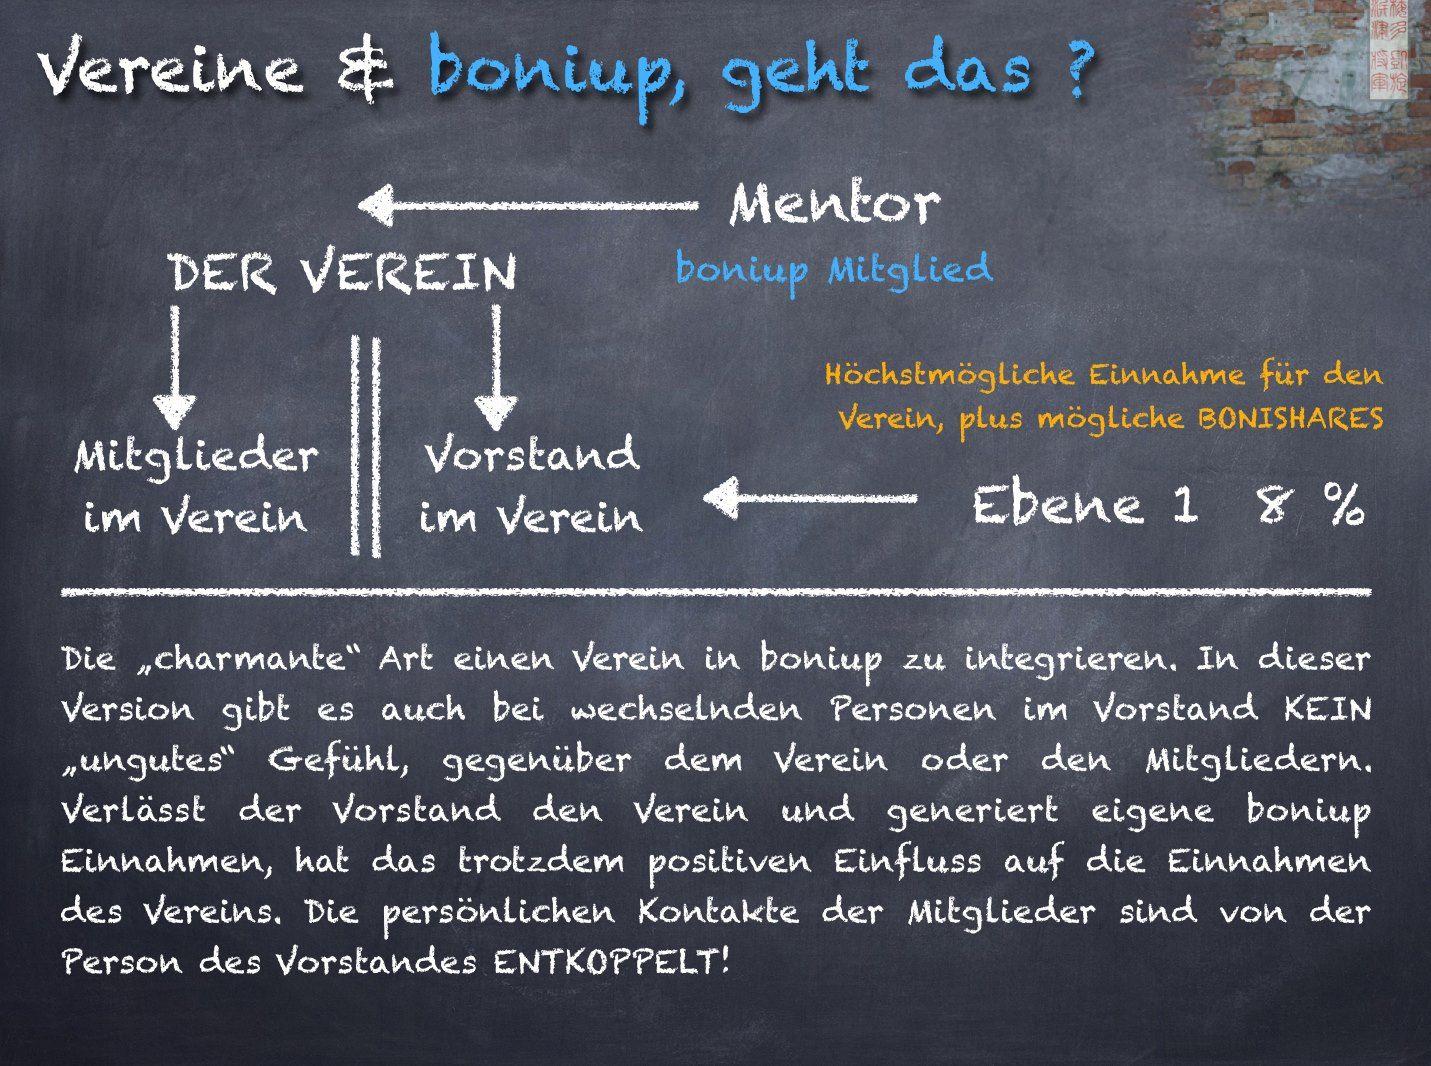 boniup - Einbindung Verein